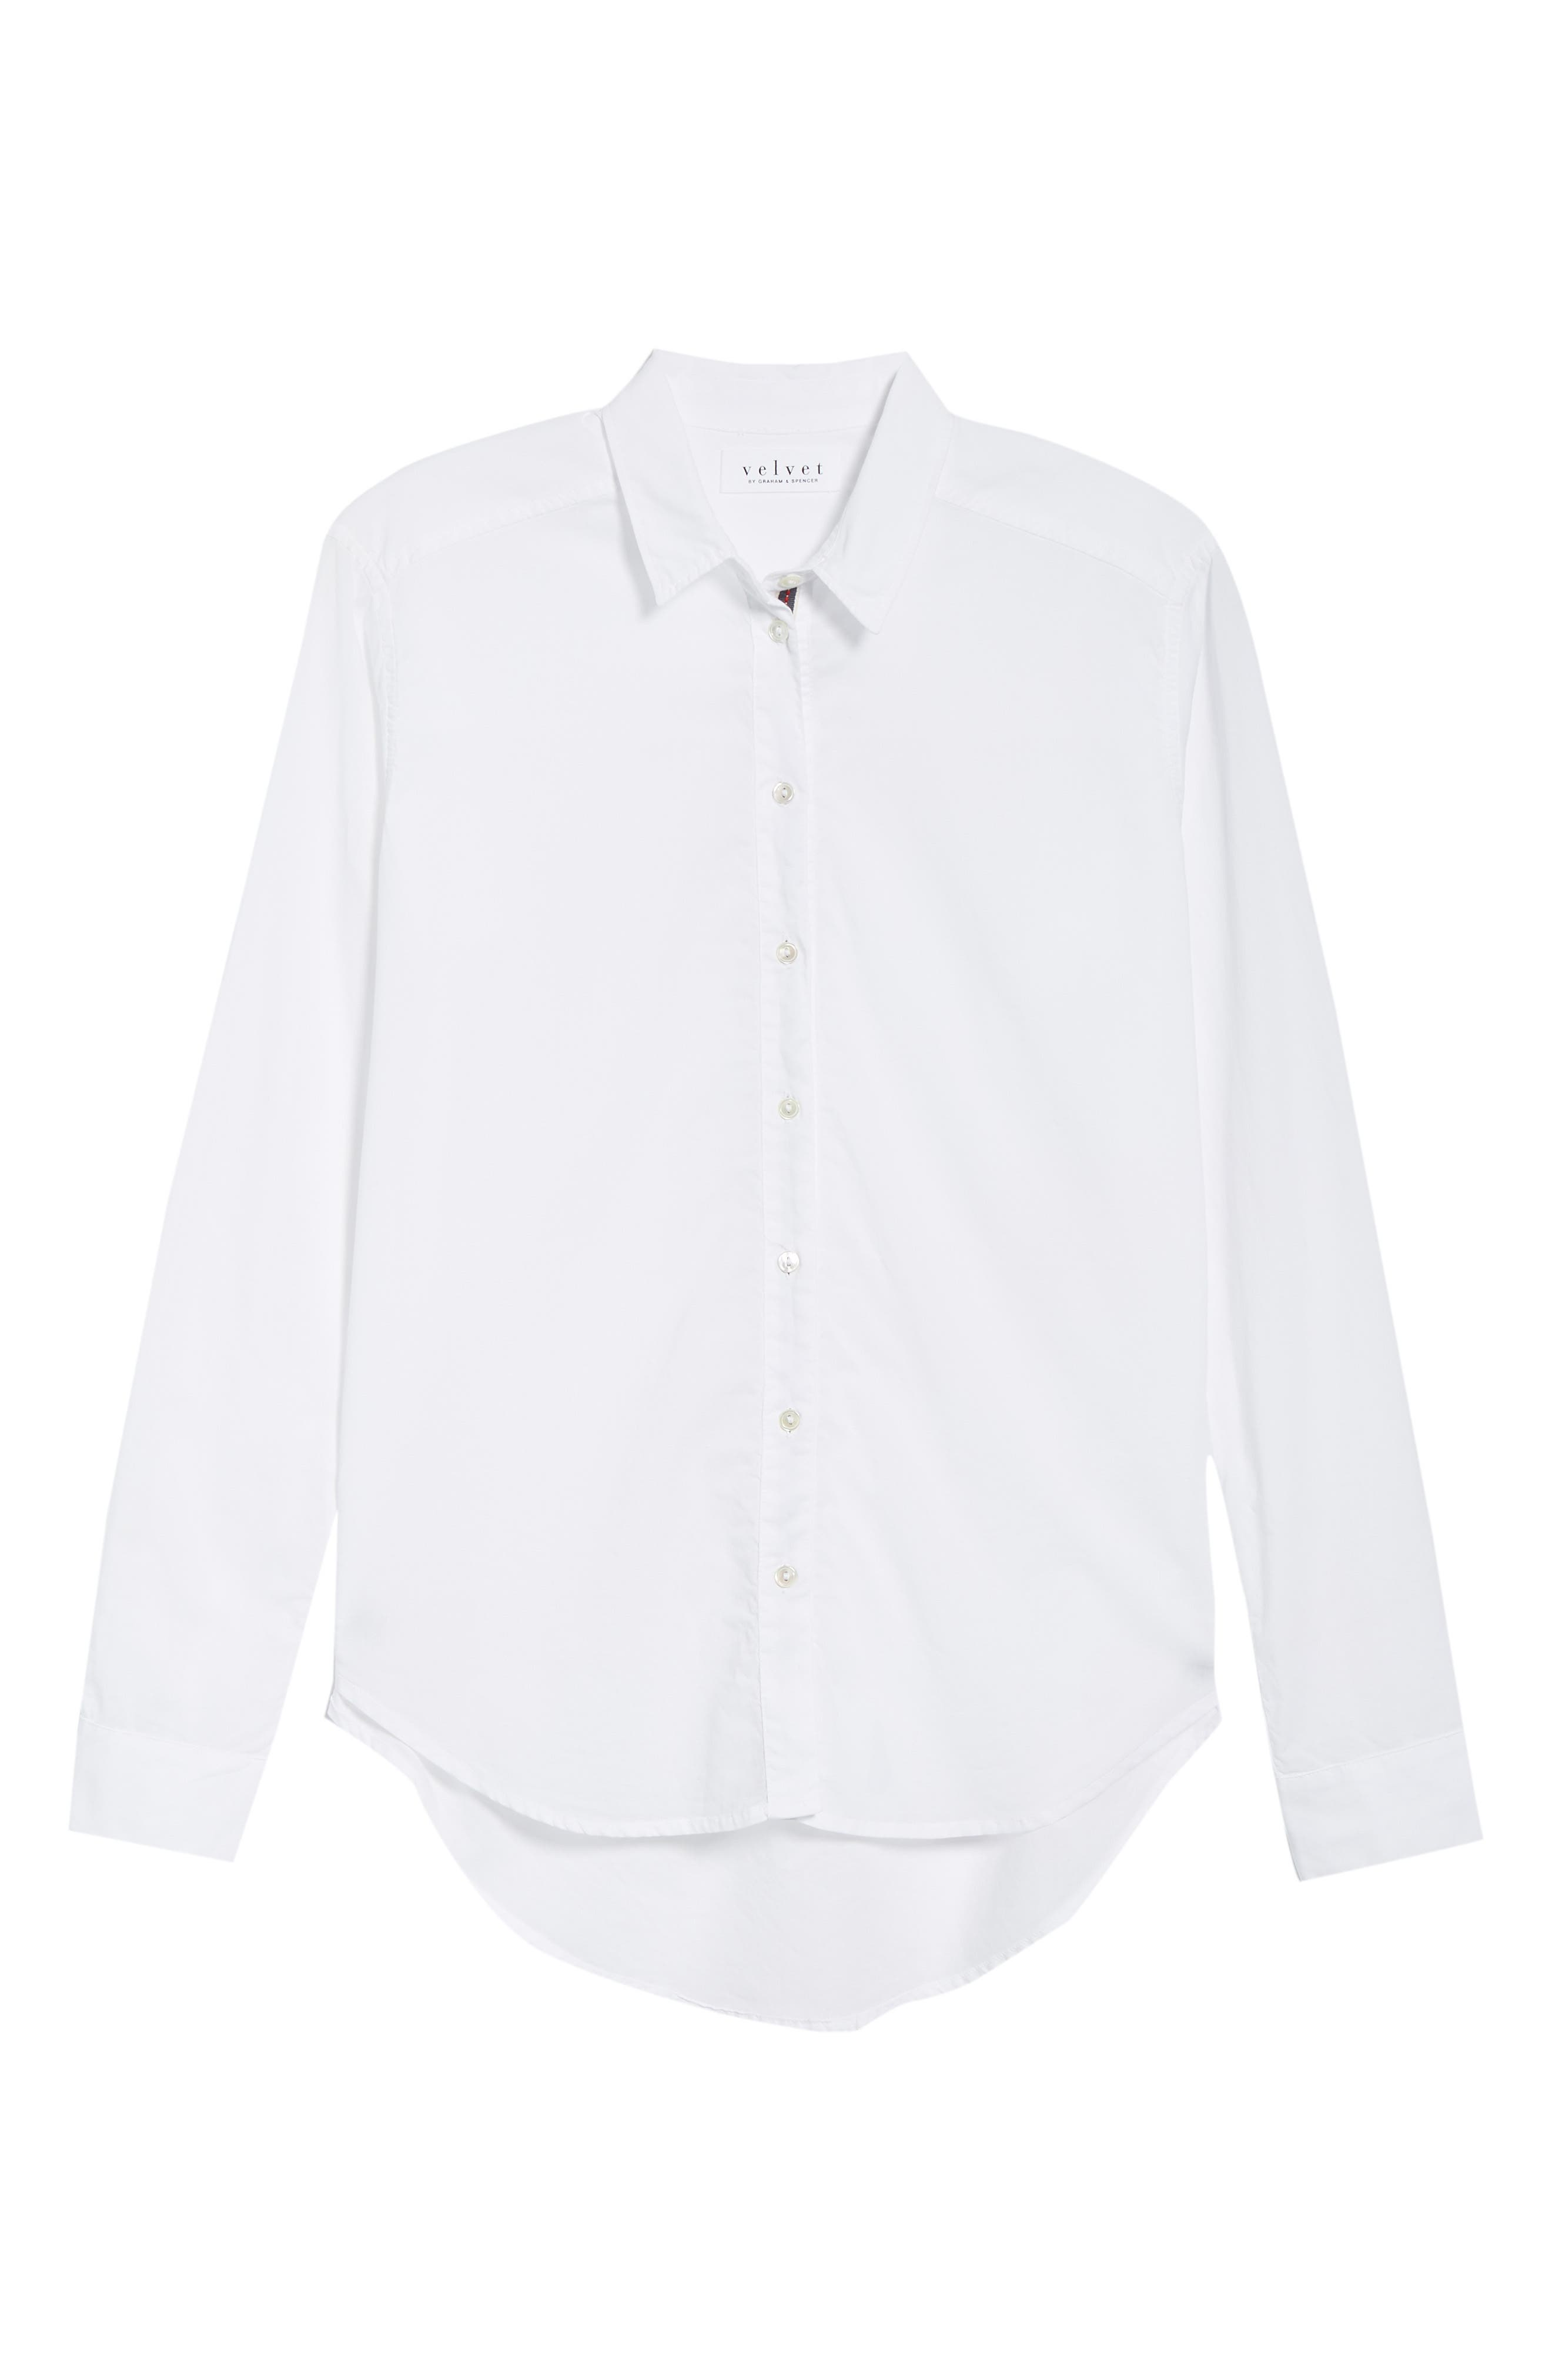 Ribbon Placket Cotton Button Up Shirt,                             Alternate thumbnail 6, color,                             WHITE